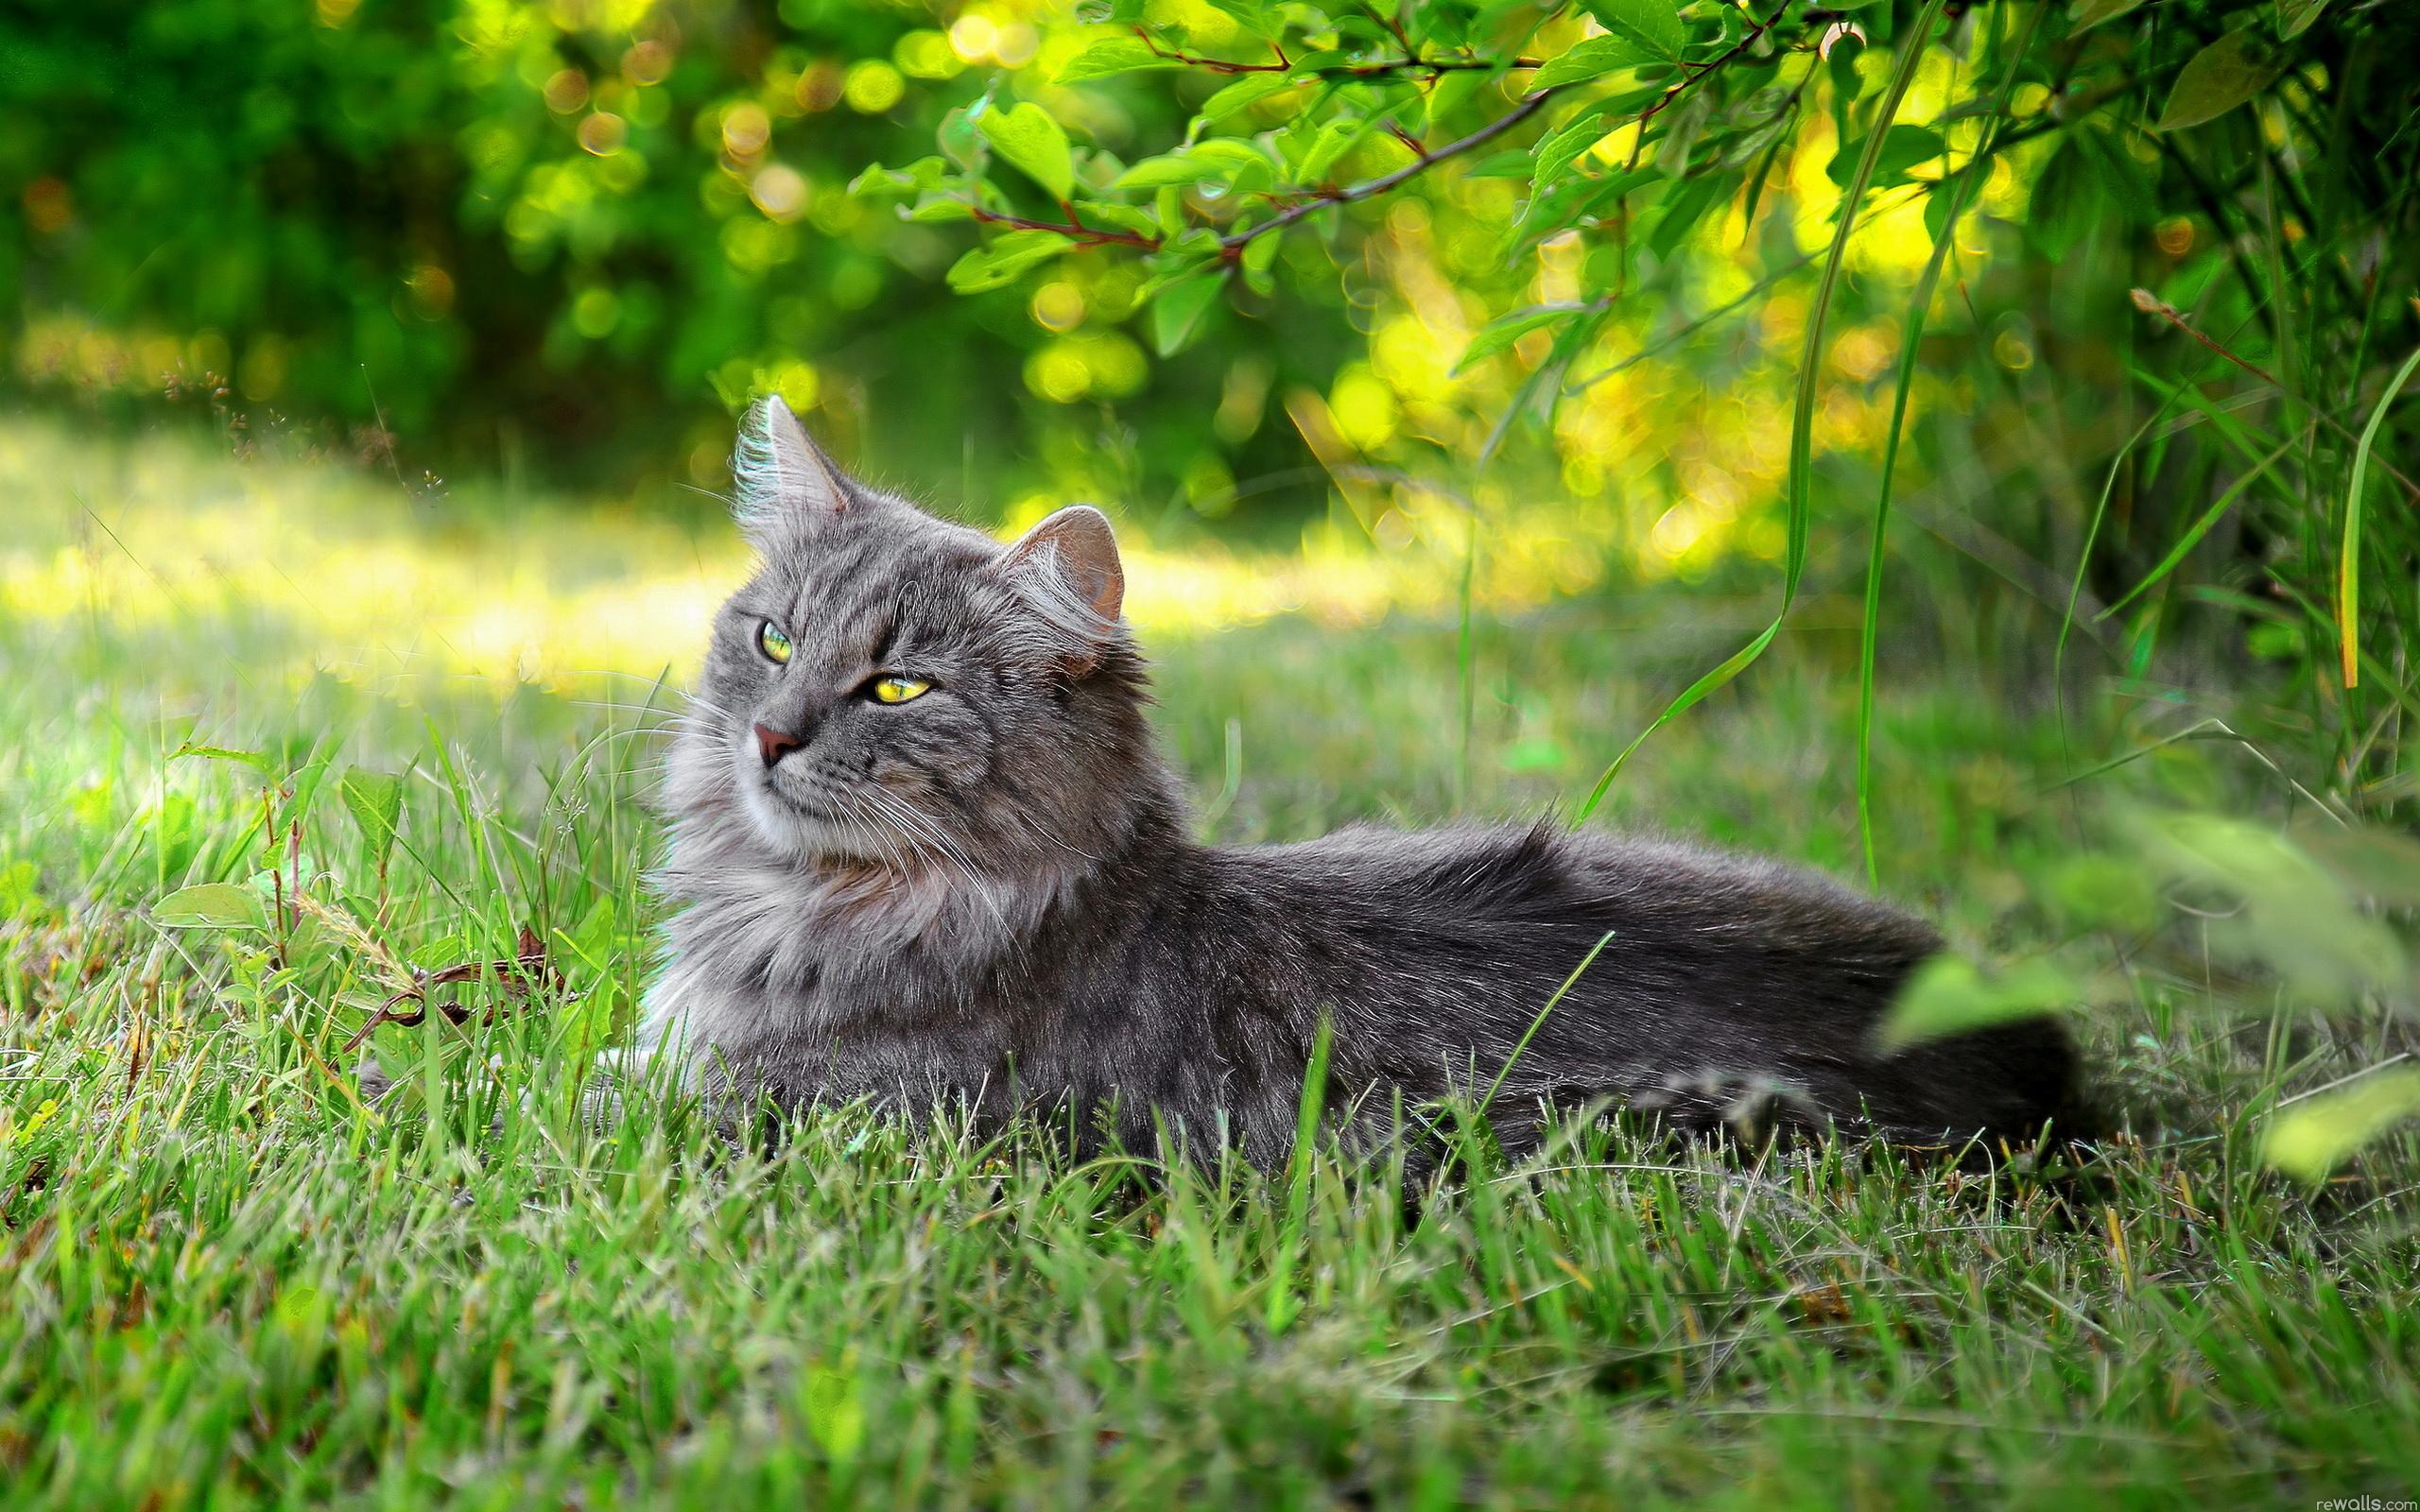 Котенок на травке  № 2954270 бесплатно